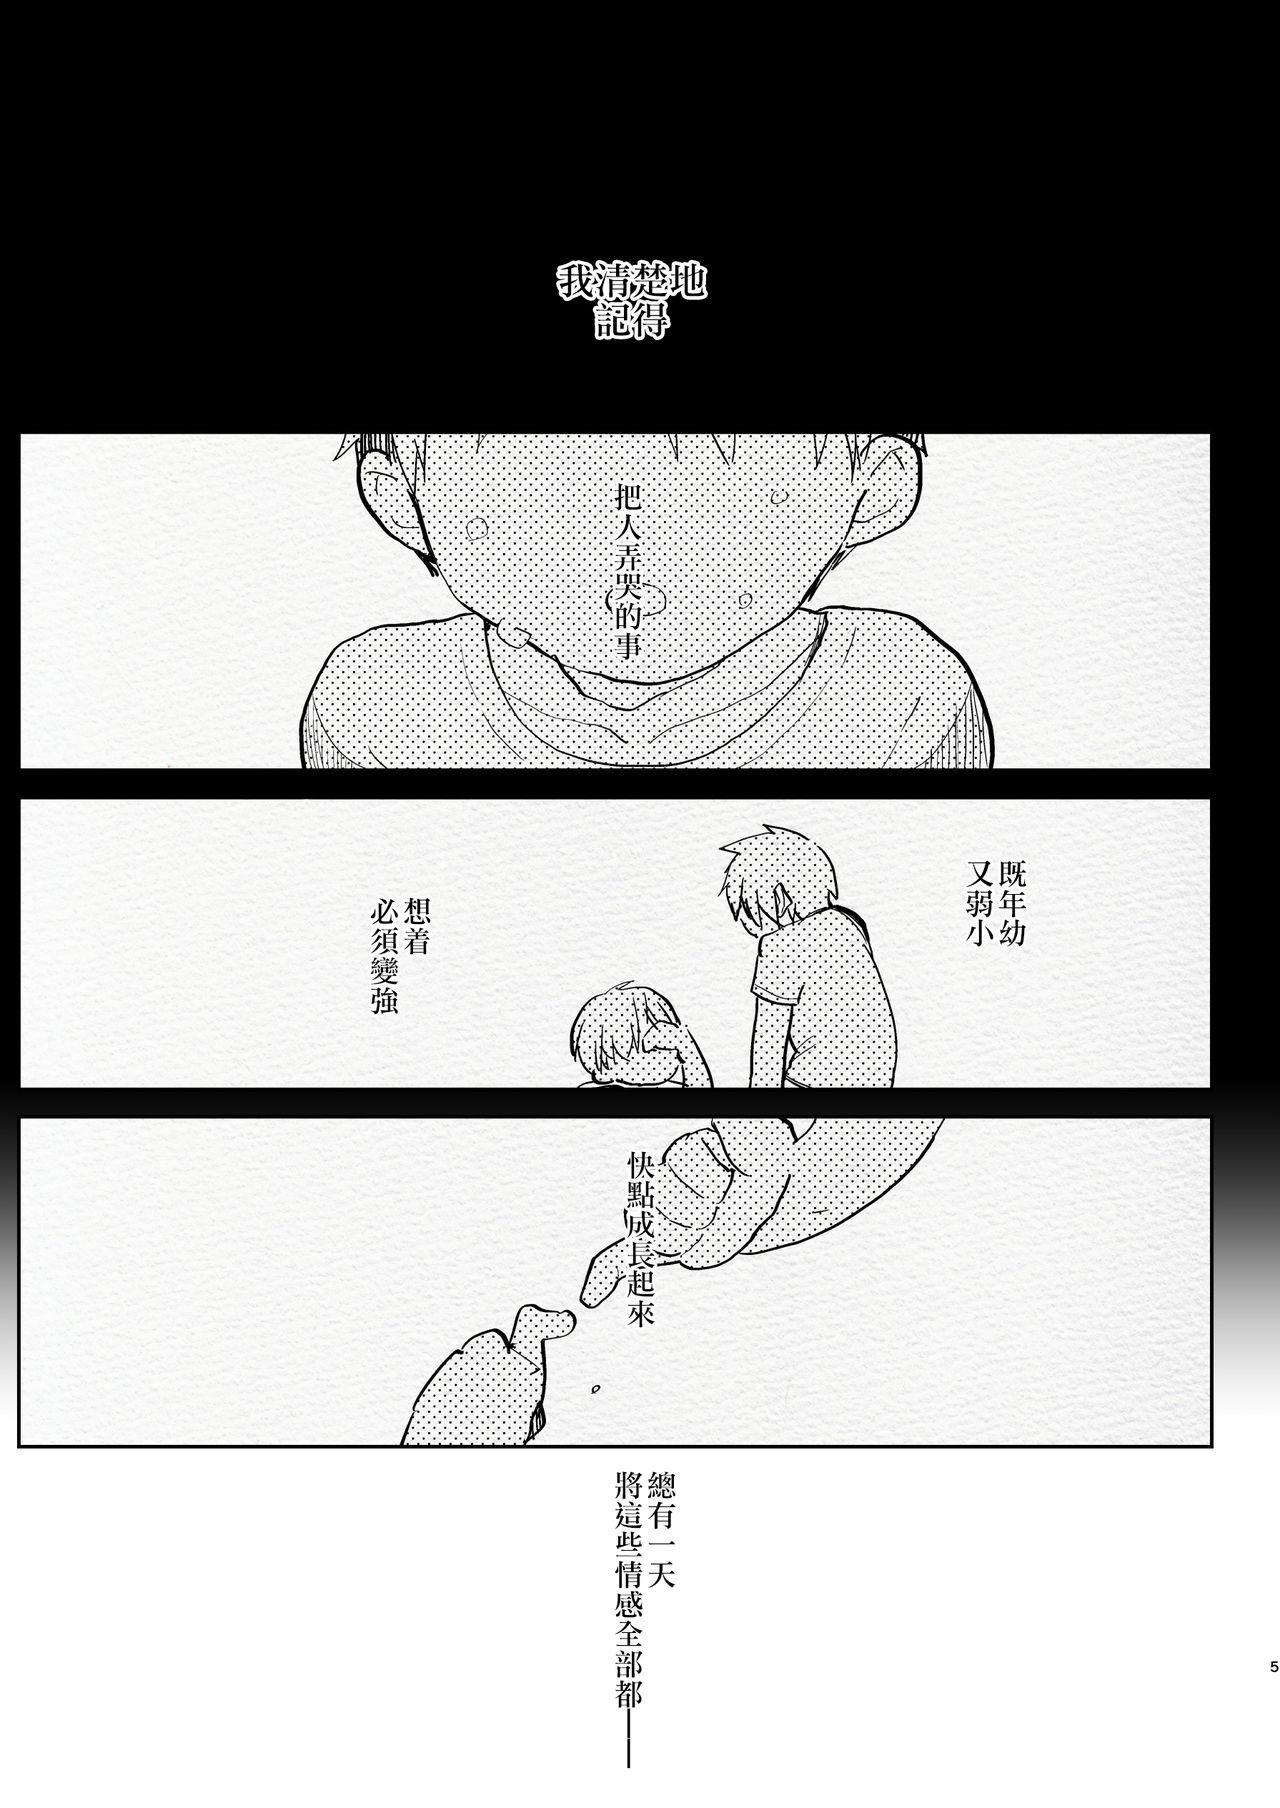 Futanari Osananajimi to Ore to Hajimete no Gyaku Anal Kagai Jugyou 丨扶她青梅竹馬和我第一次的反向小穴做愛課外授課 5